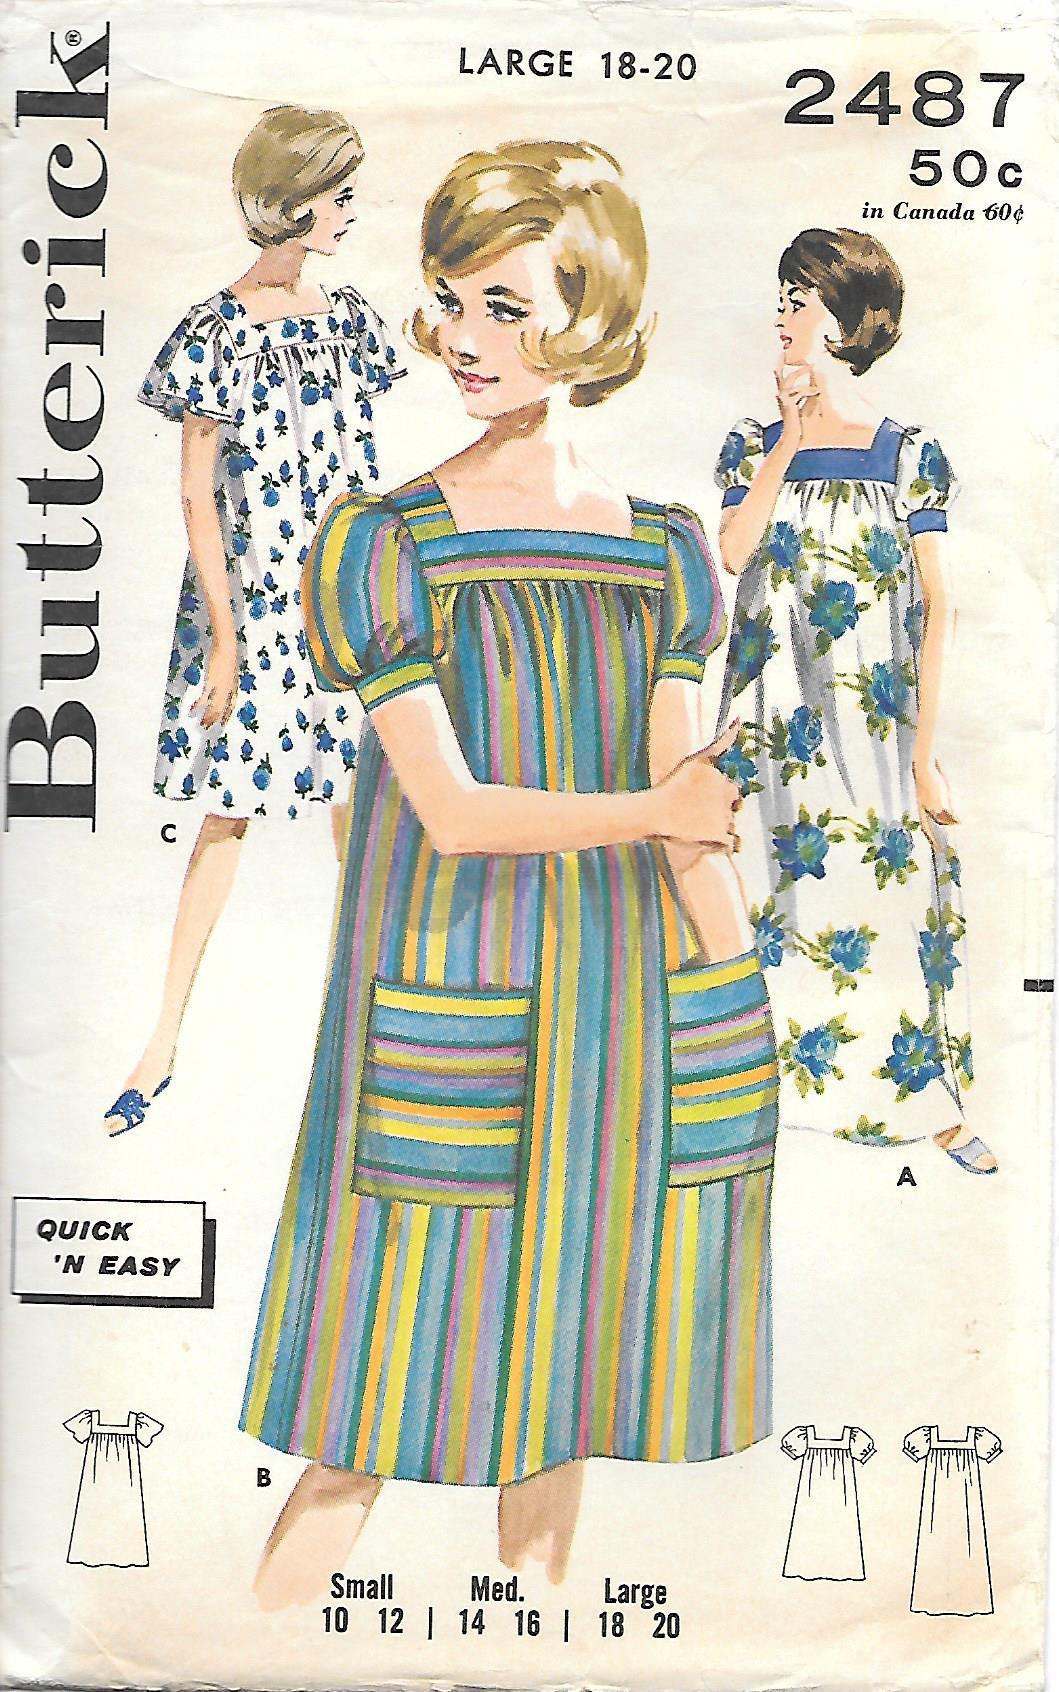 c46533ab590f1 1960s Butterick 2487 Classic Muumuu Vintage Sewing Pattern | Etsy